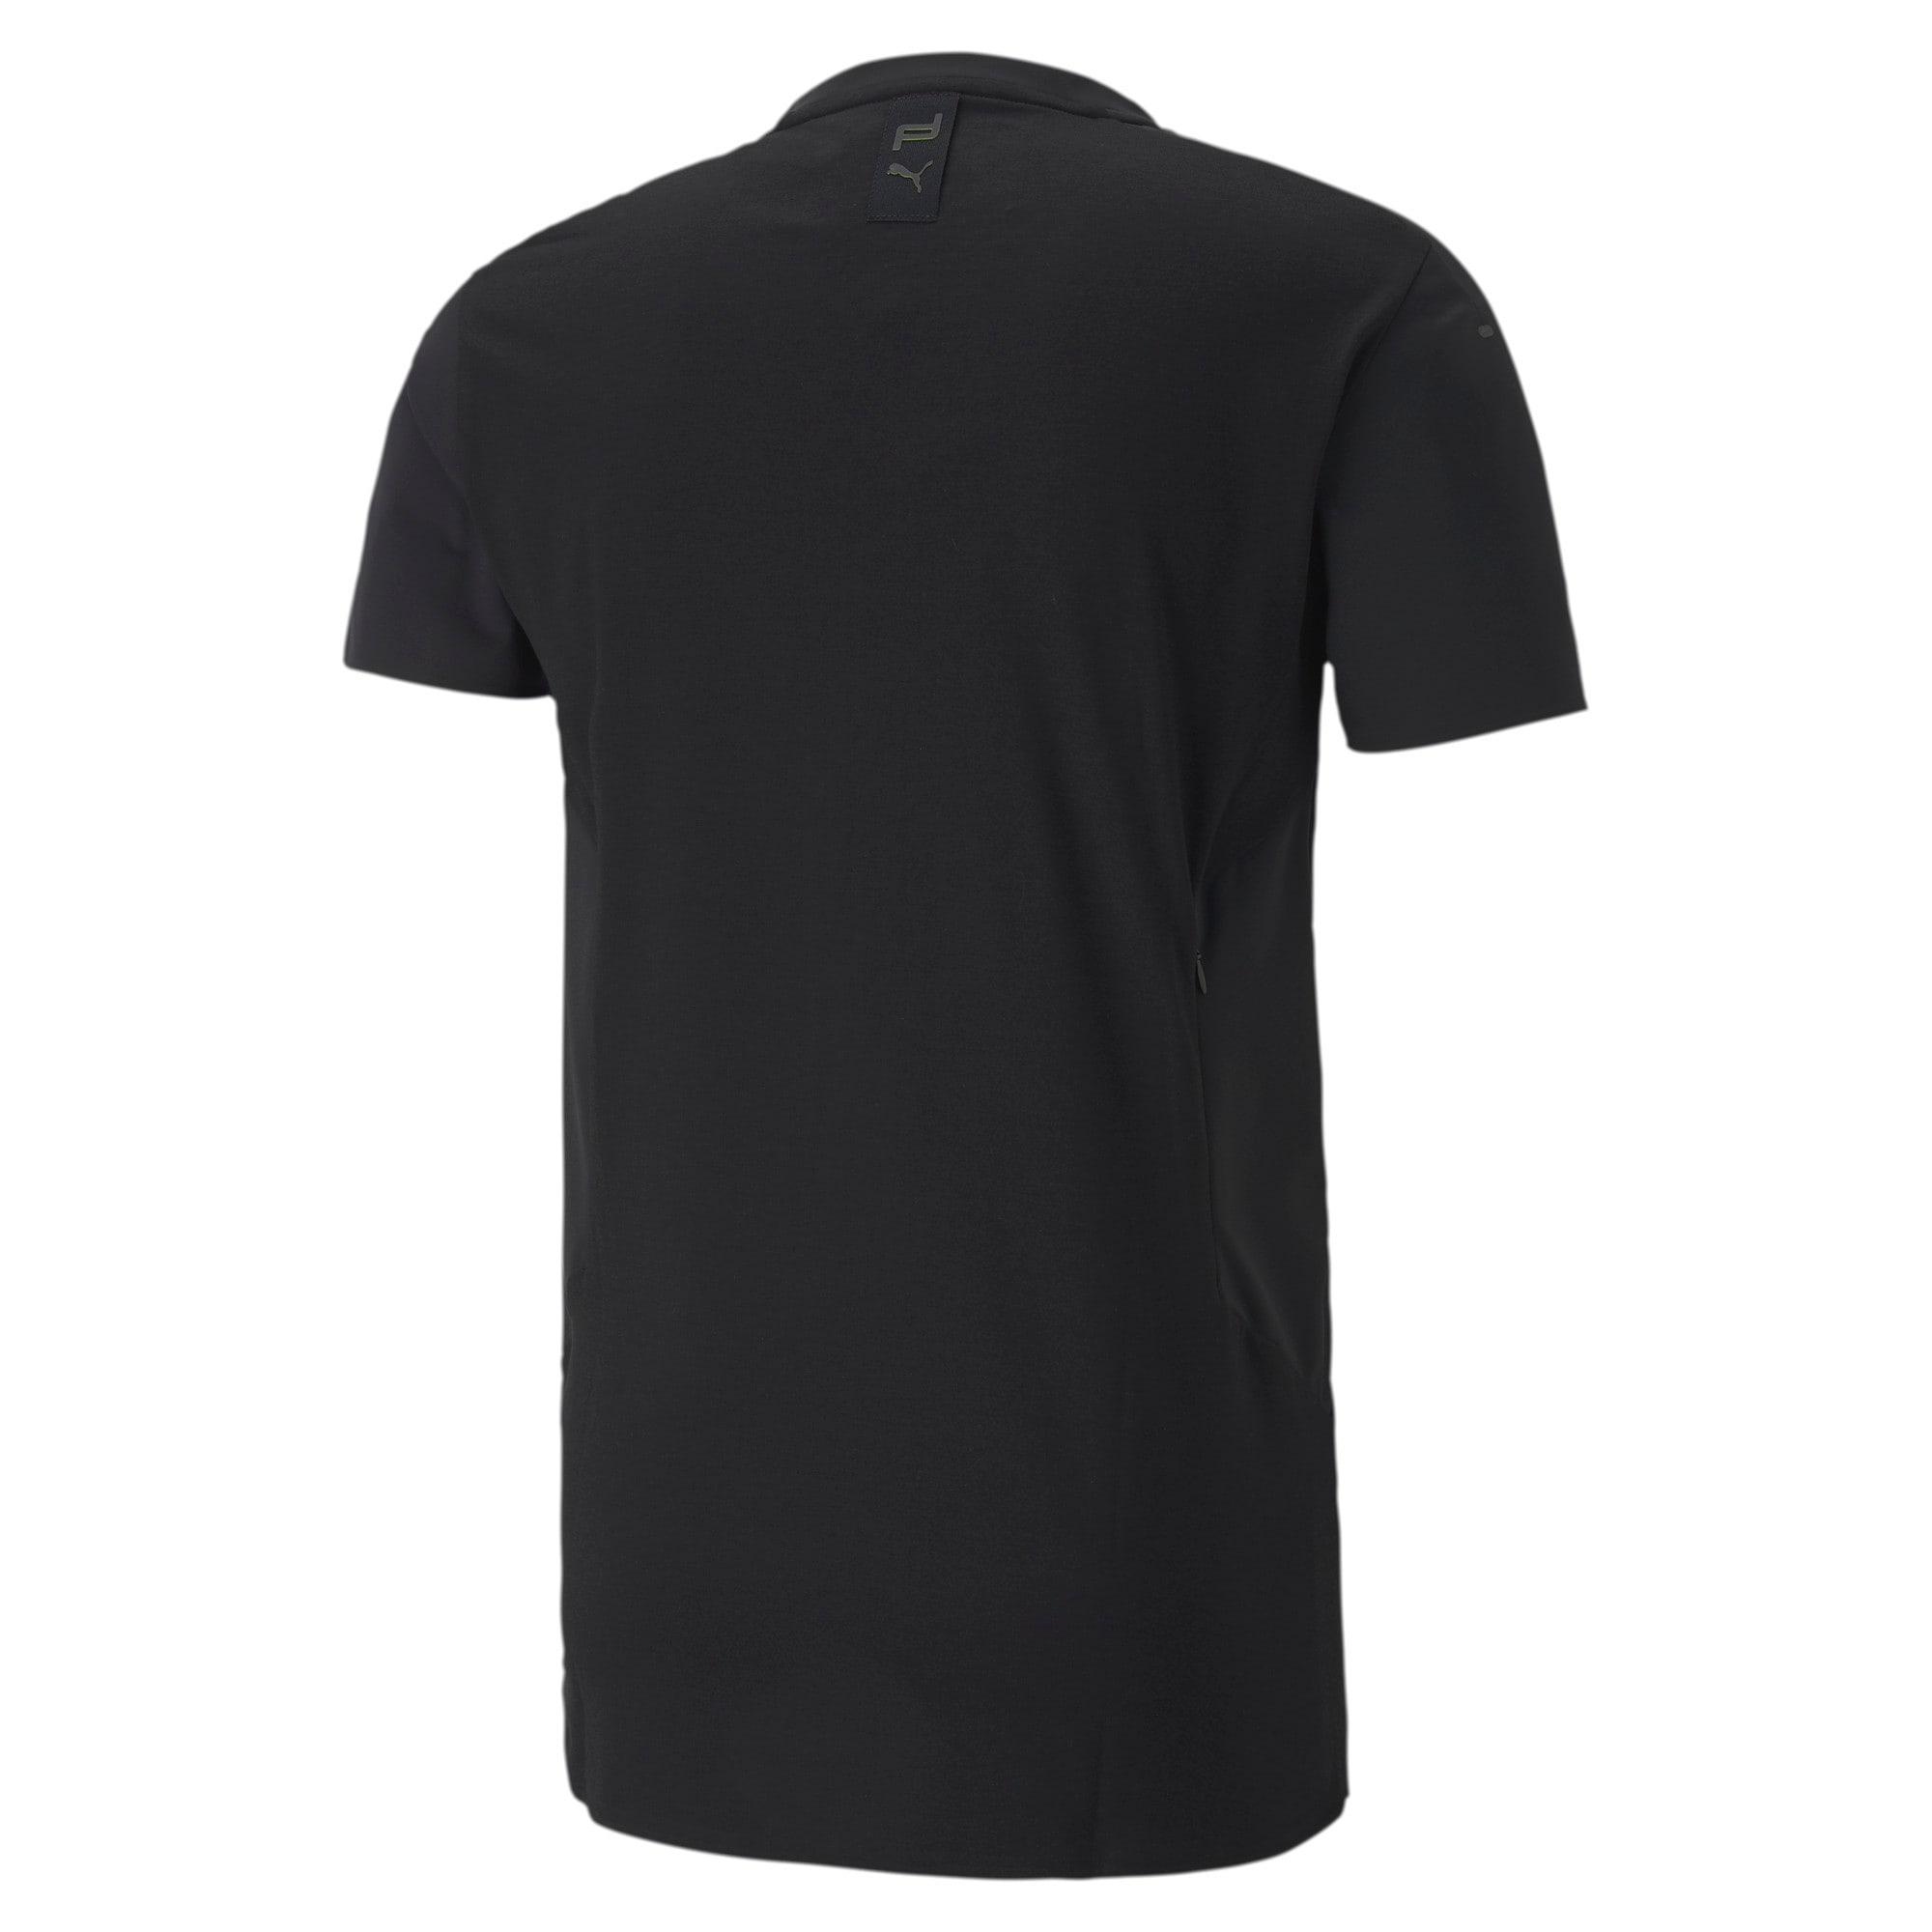 Miniatura 5 de Camiseta Porsche Design RCT para hombre, Jet Black, mediano